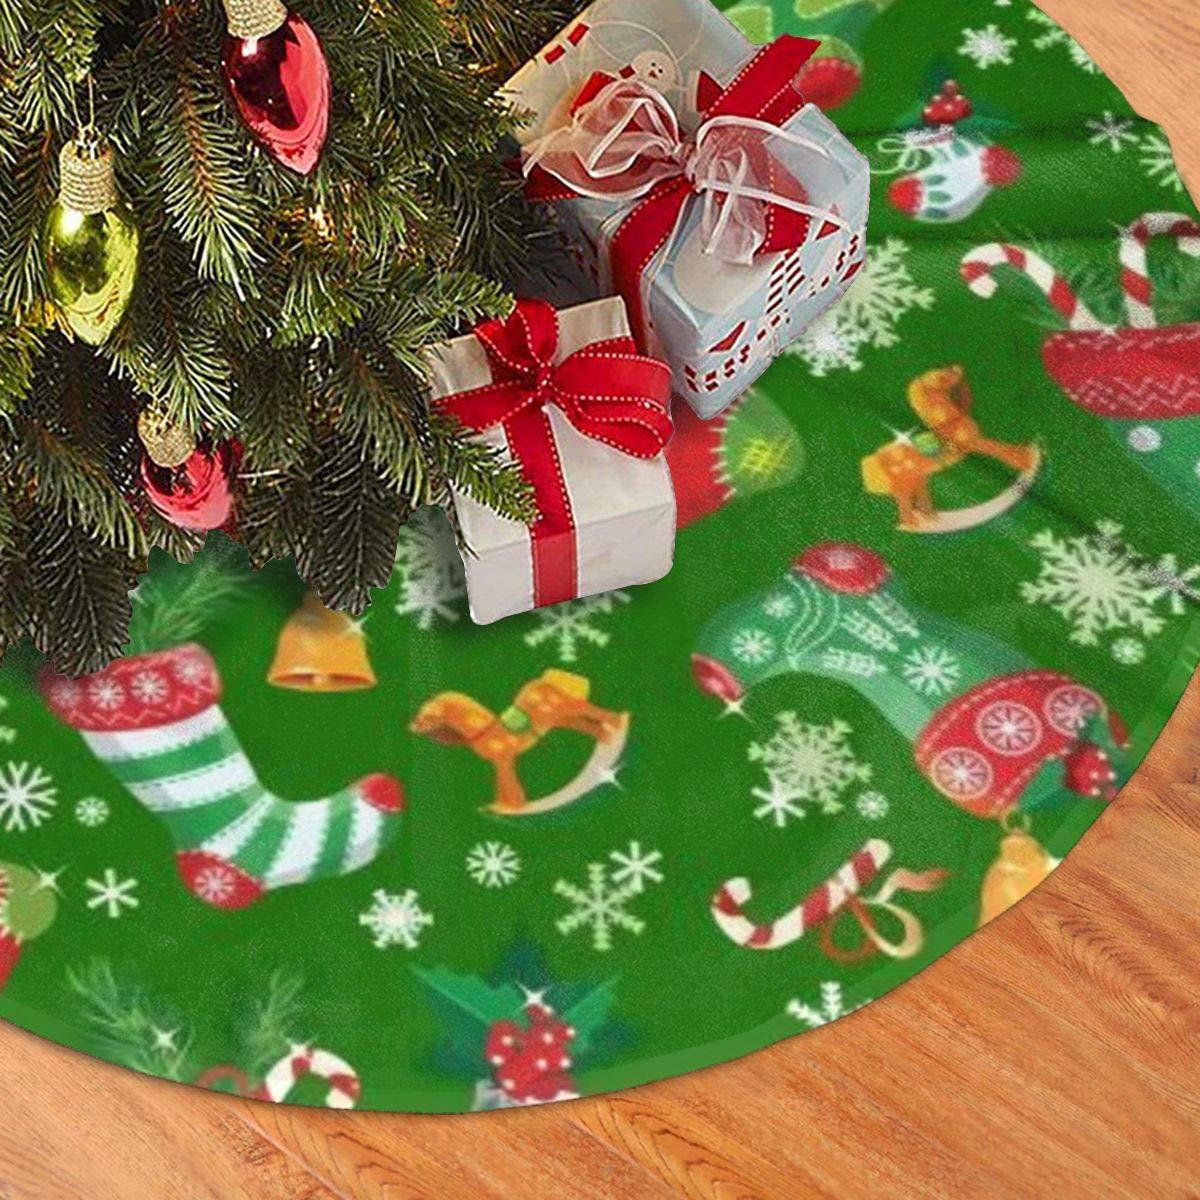 new home housewarming gift farmhouse holiday decor holiday decor birthday gift for mom christmas tree skirt winter gift for grandma